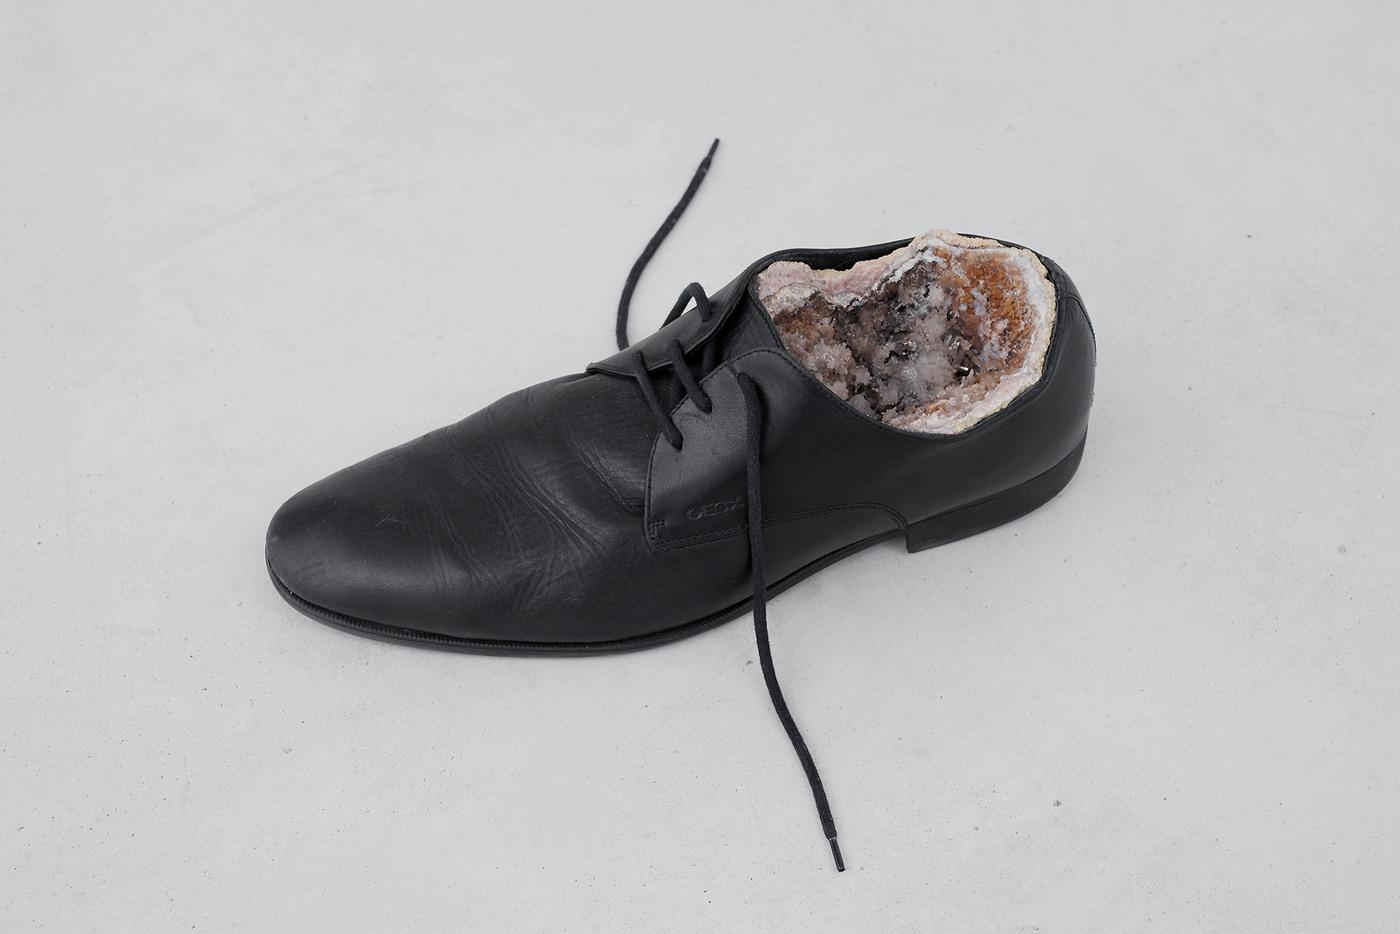 Foot (low)